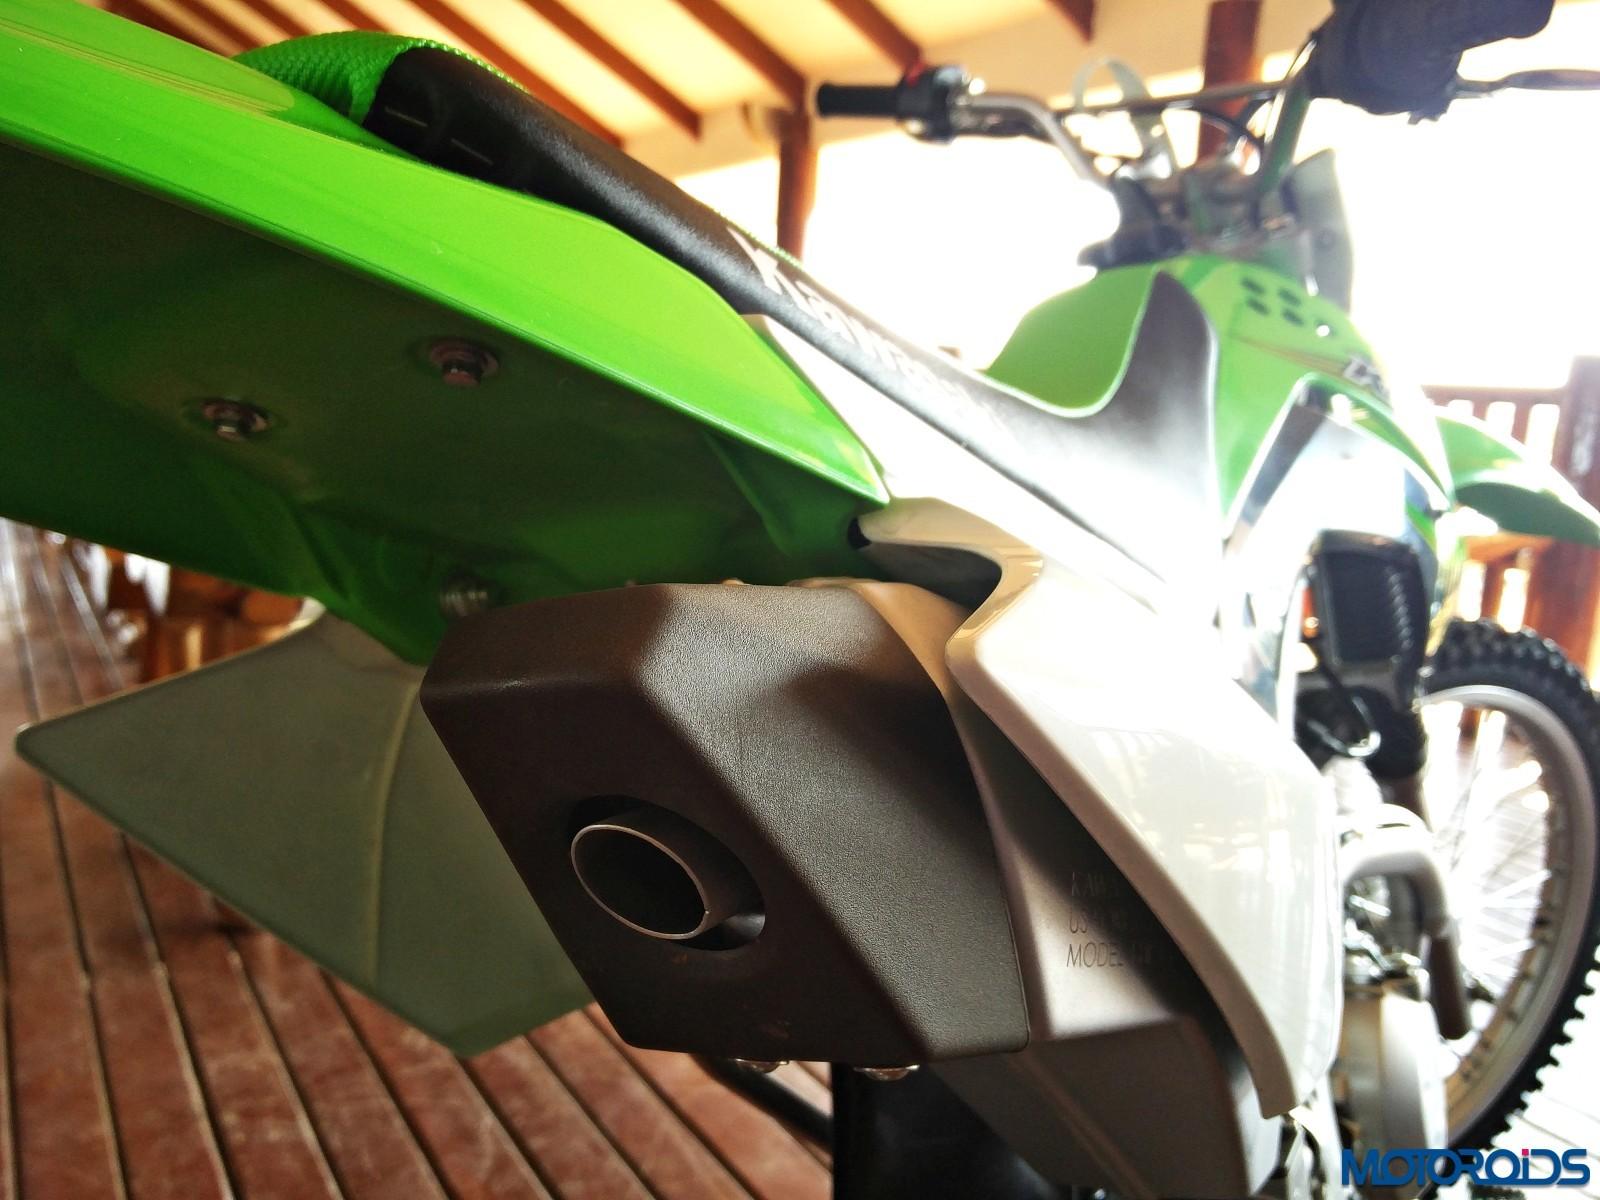 Kawasaki-KLX140G-Ride-Experience-21